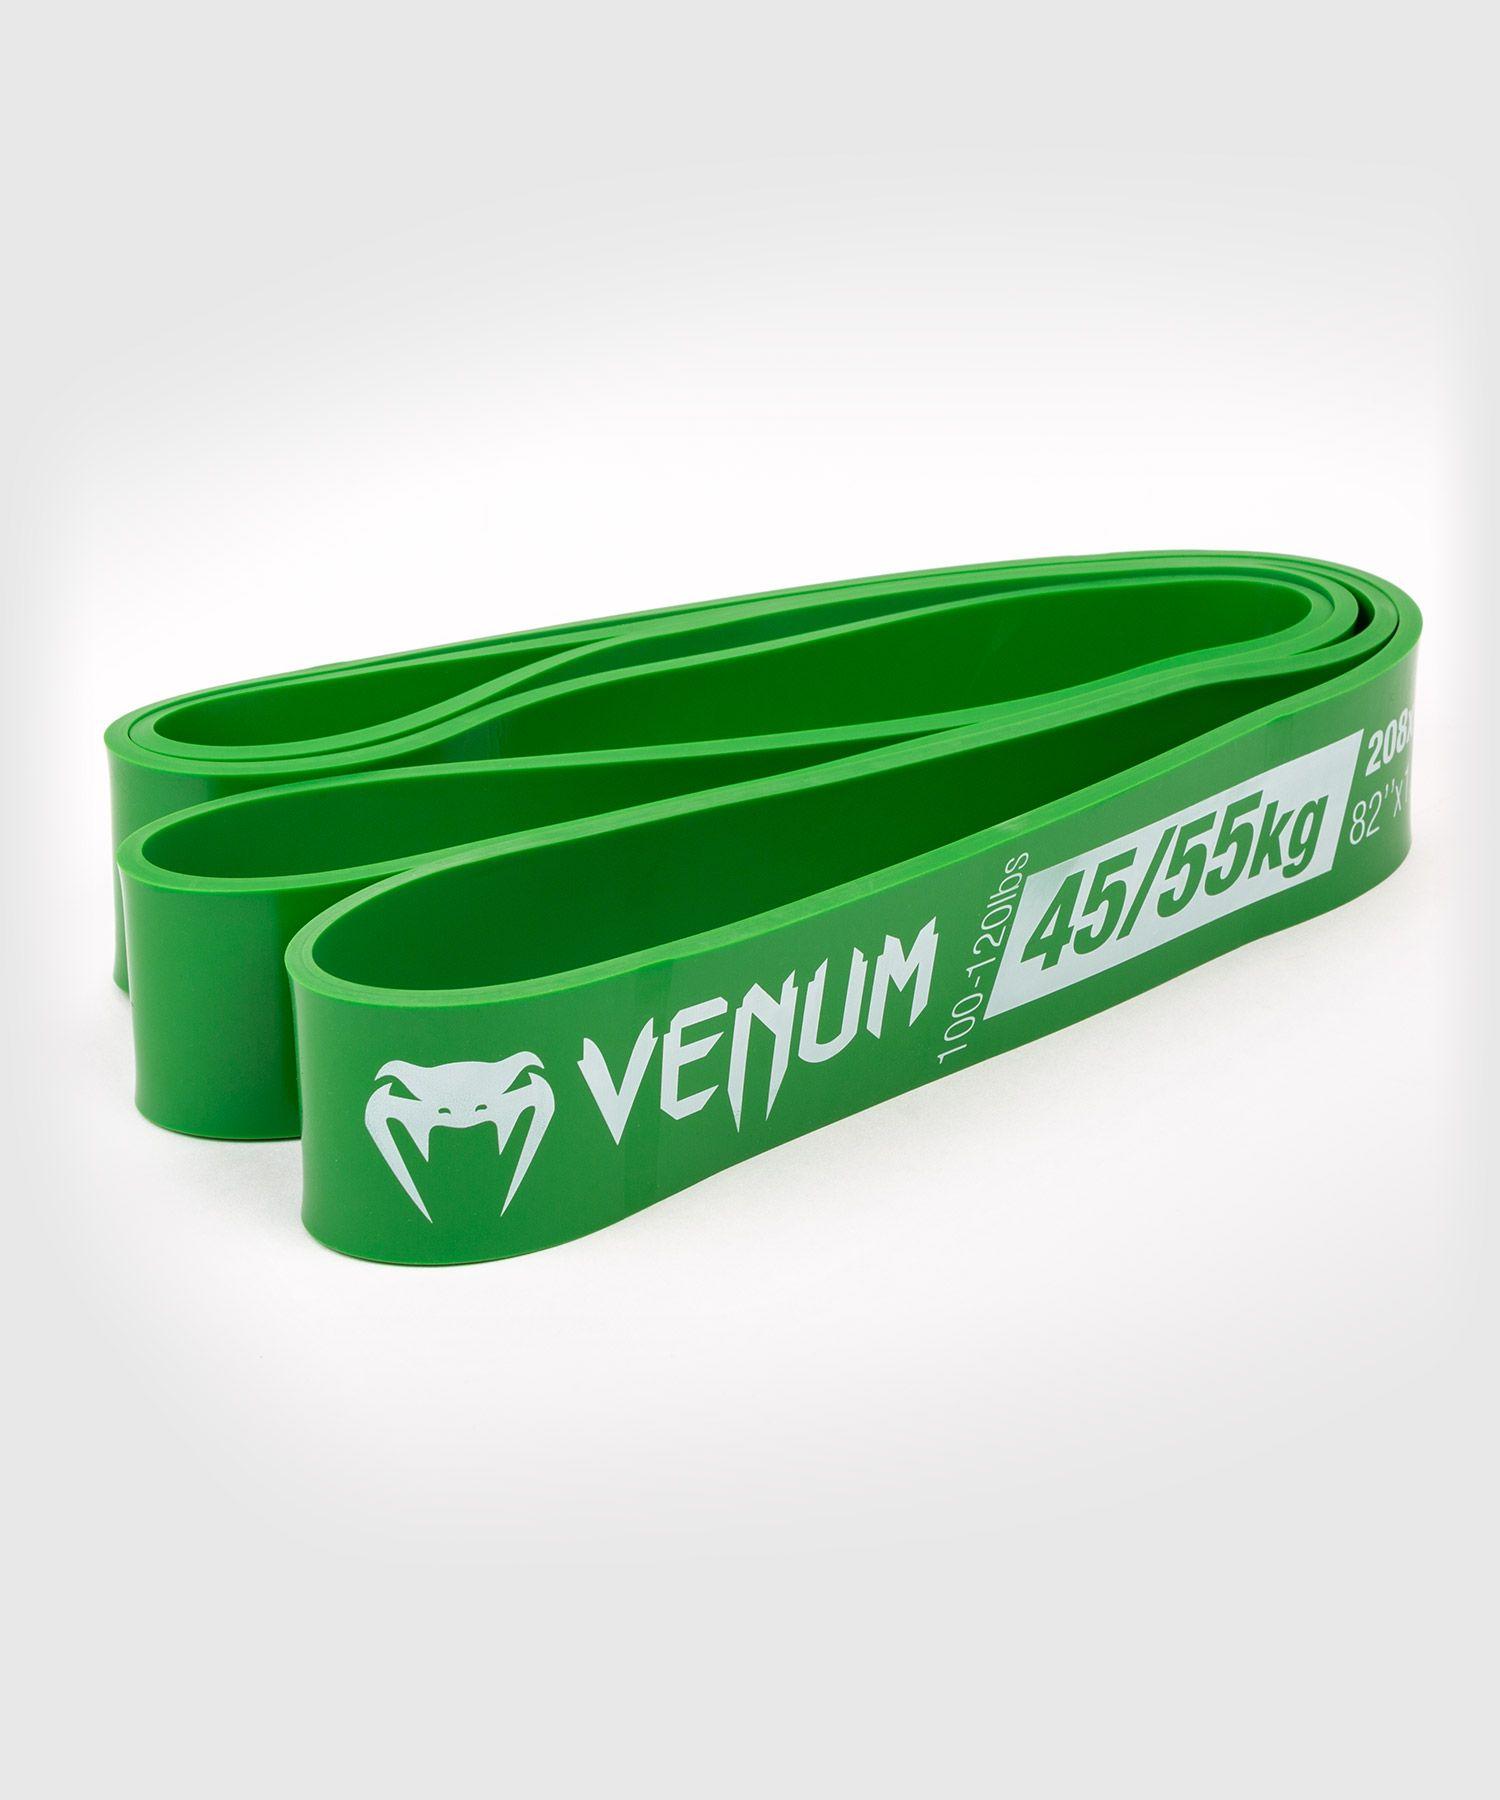 Bande di resistenza Venum Challenger - Verde - 45-55Kg